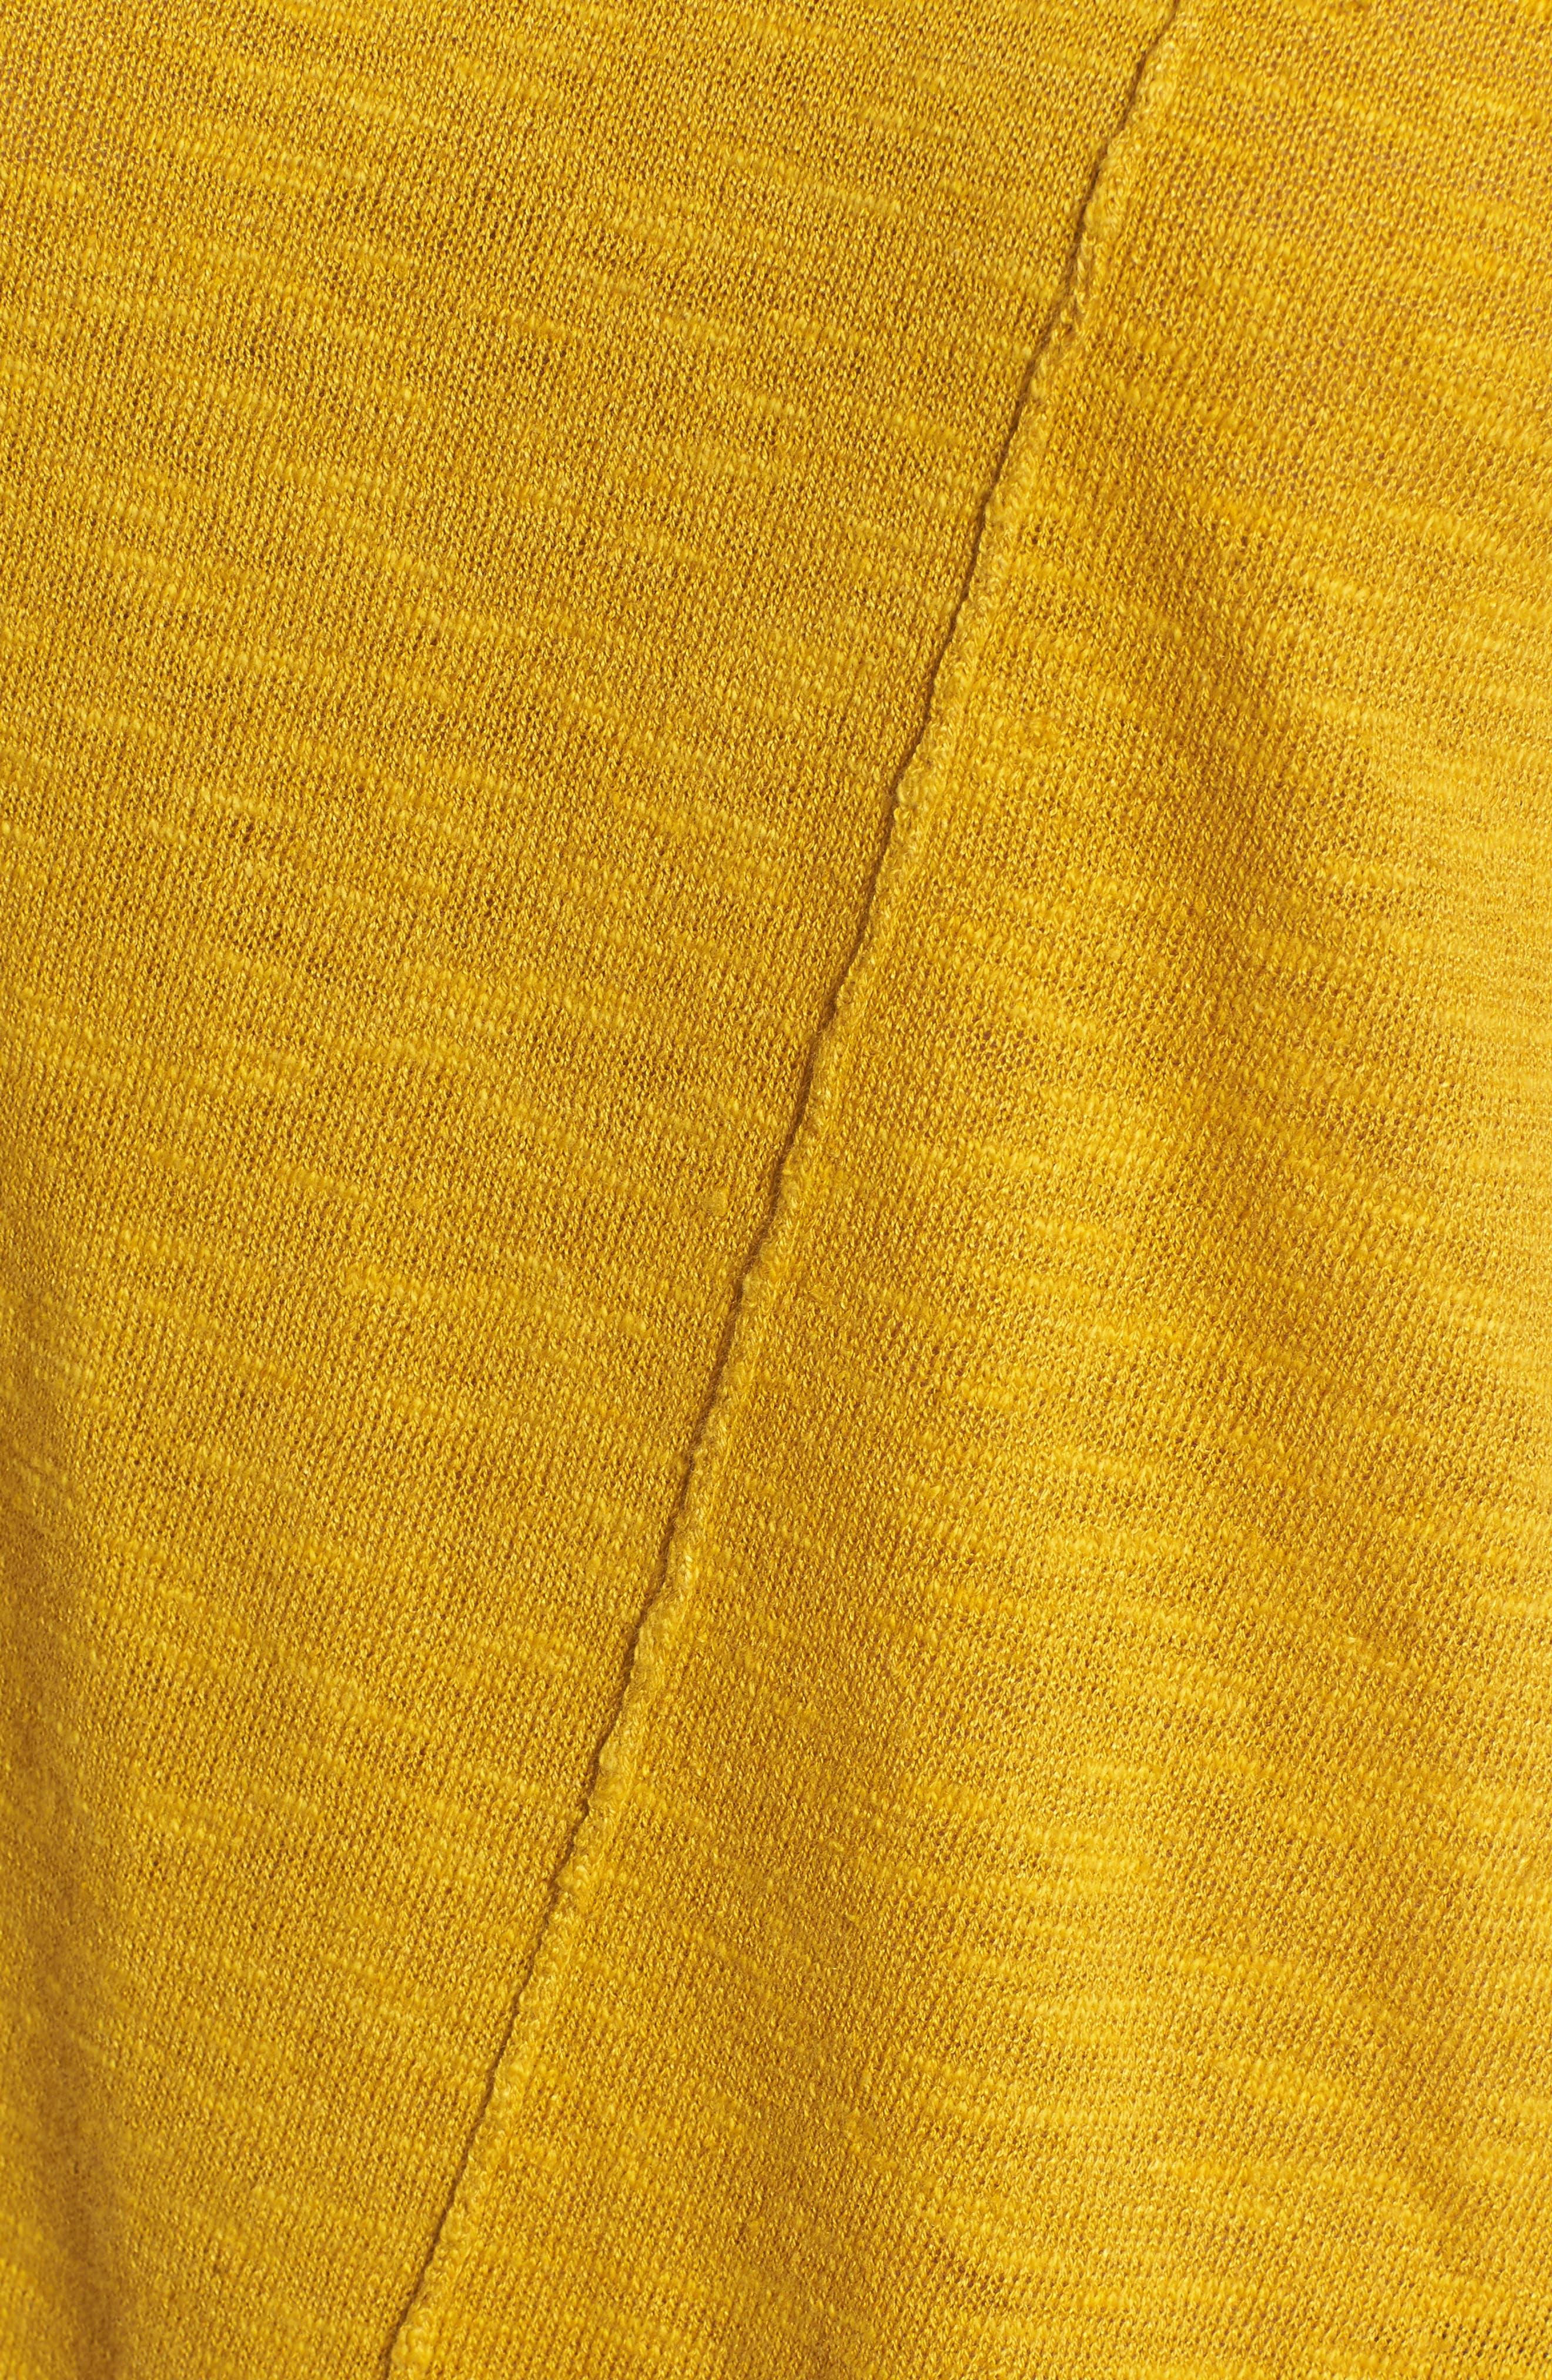 Cap Sleeve Organic Linen & Cotton Scoop Neck Top,                             Alternate thumbnail 71, color,